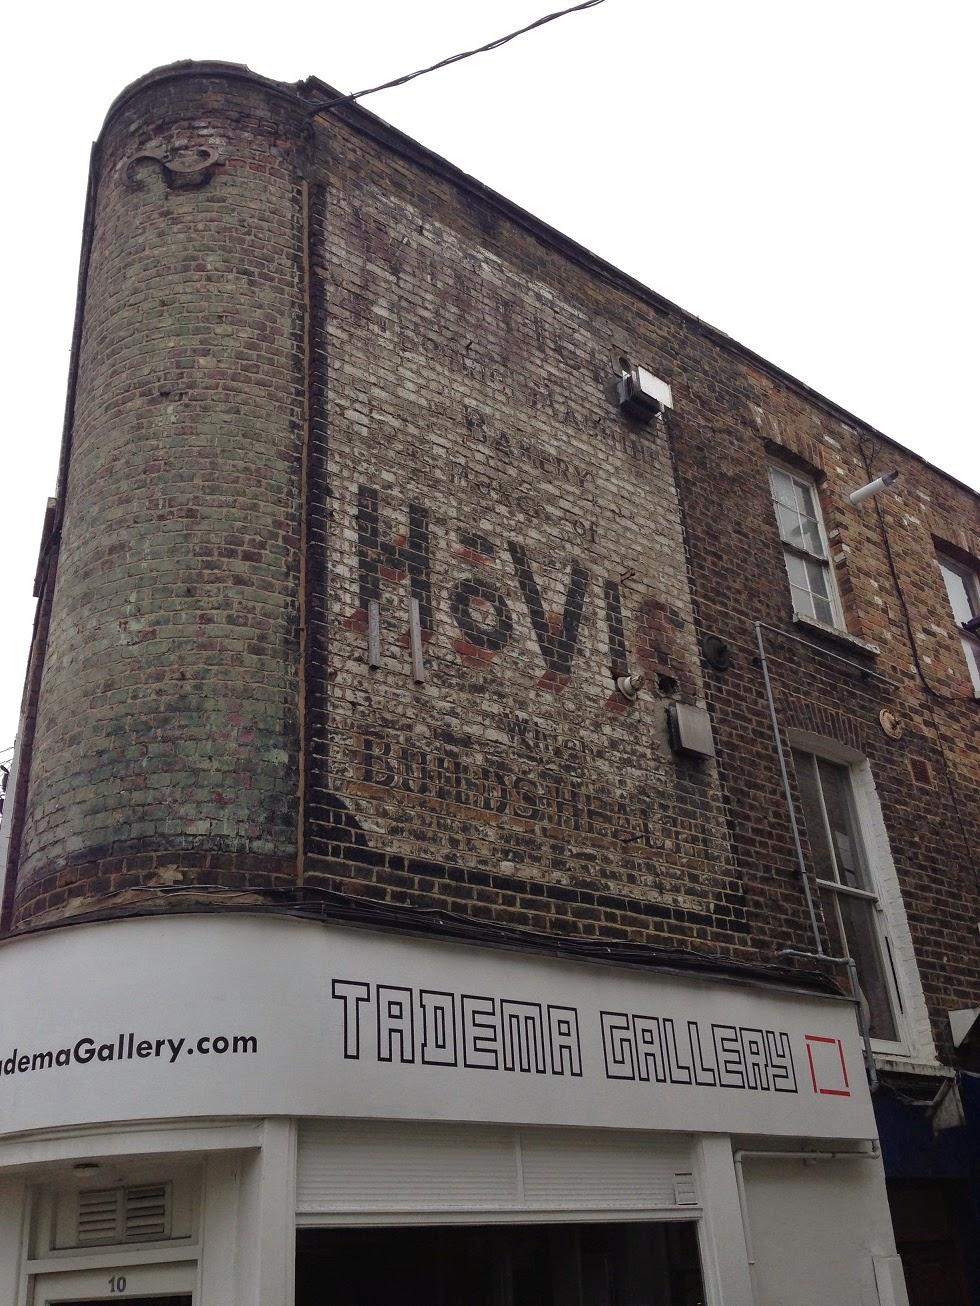 Ghost sign, Islington, London